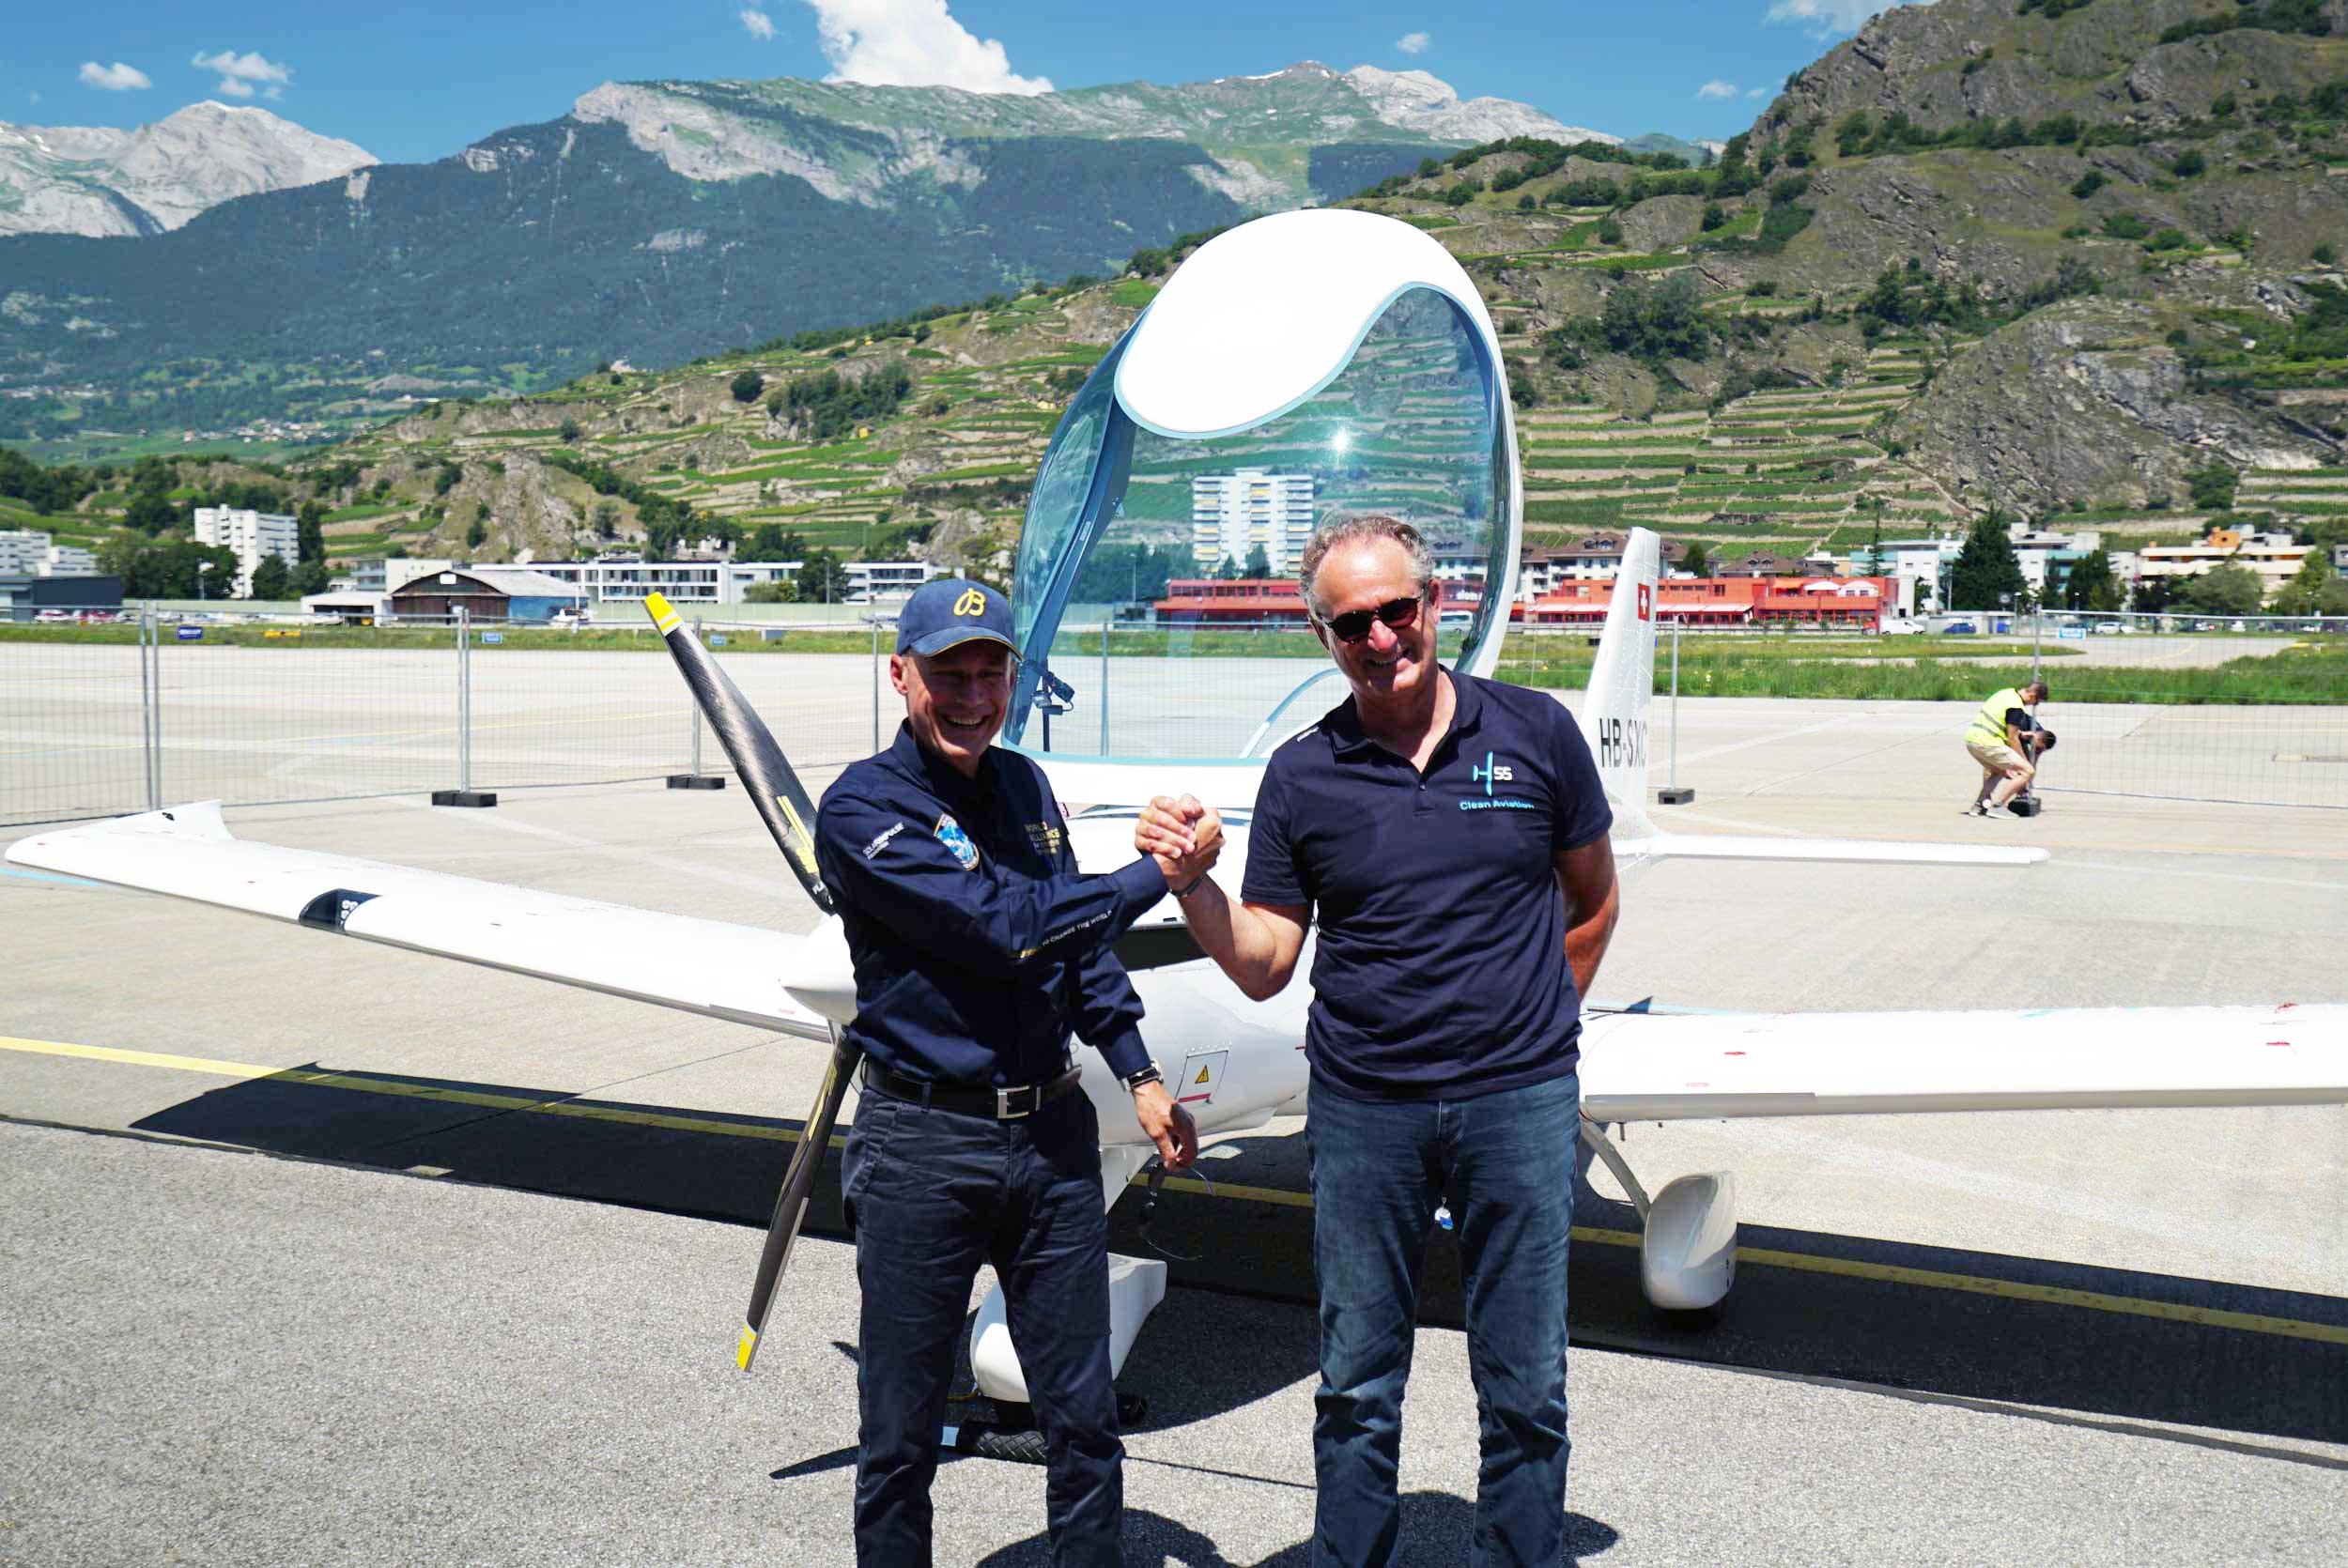 H55 Solar Impulse pilots